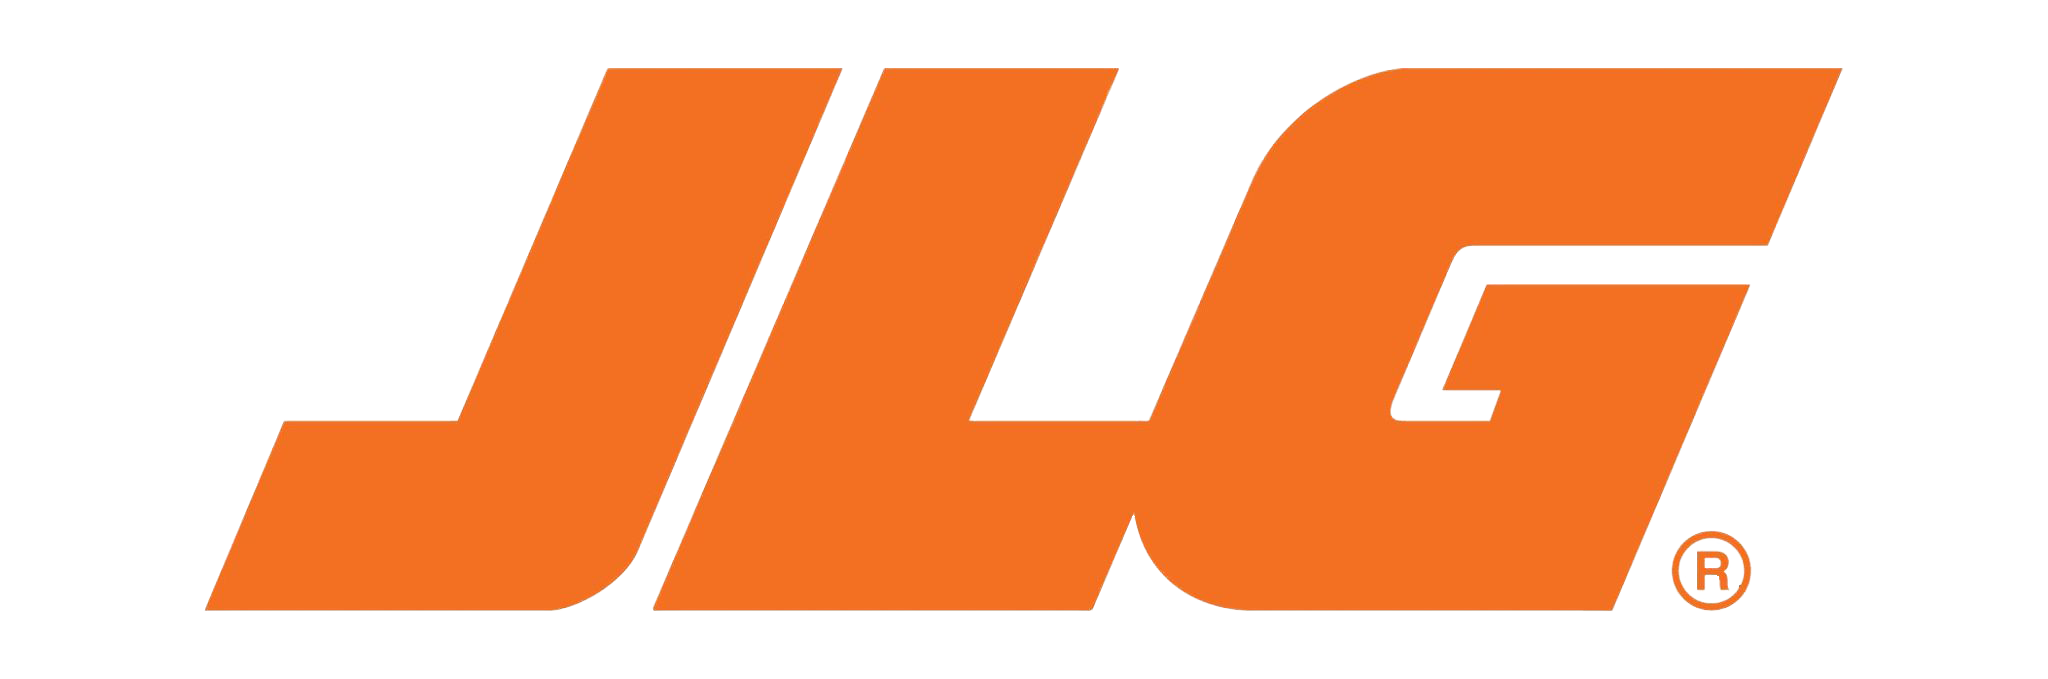 JLG brand